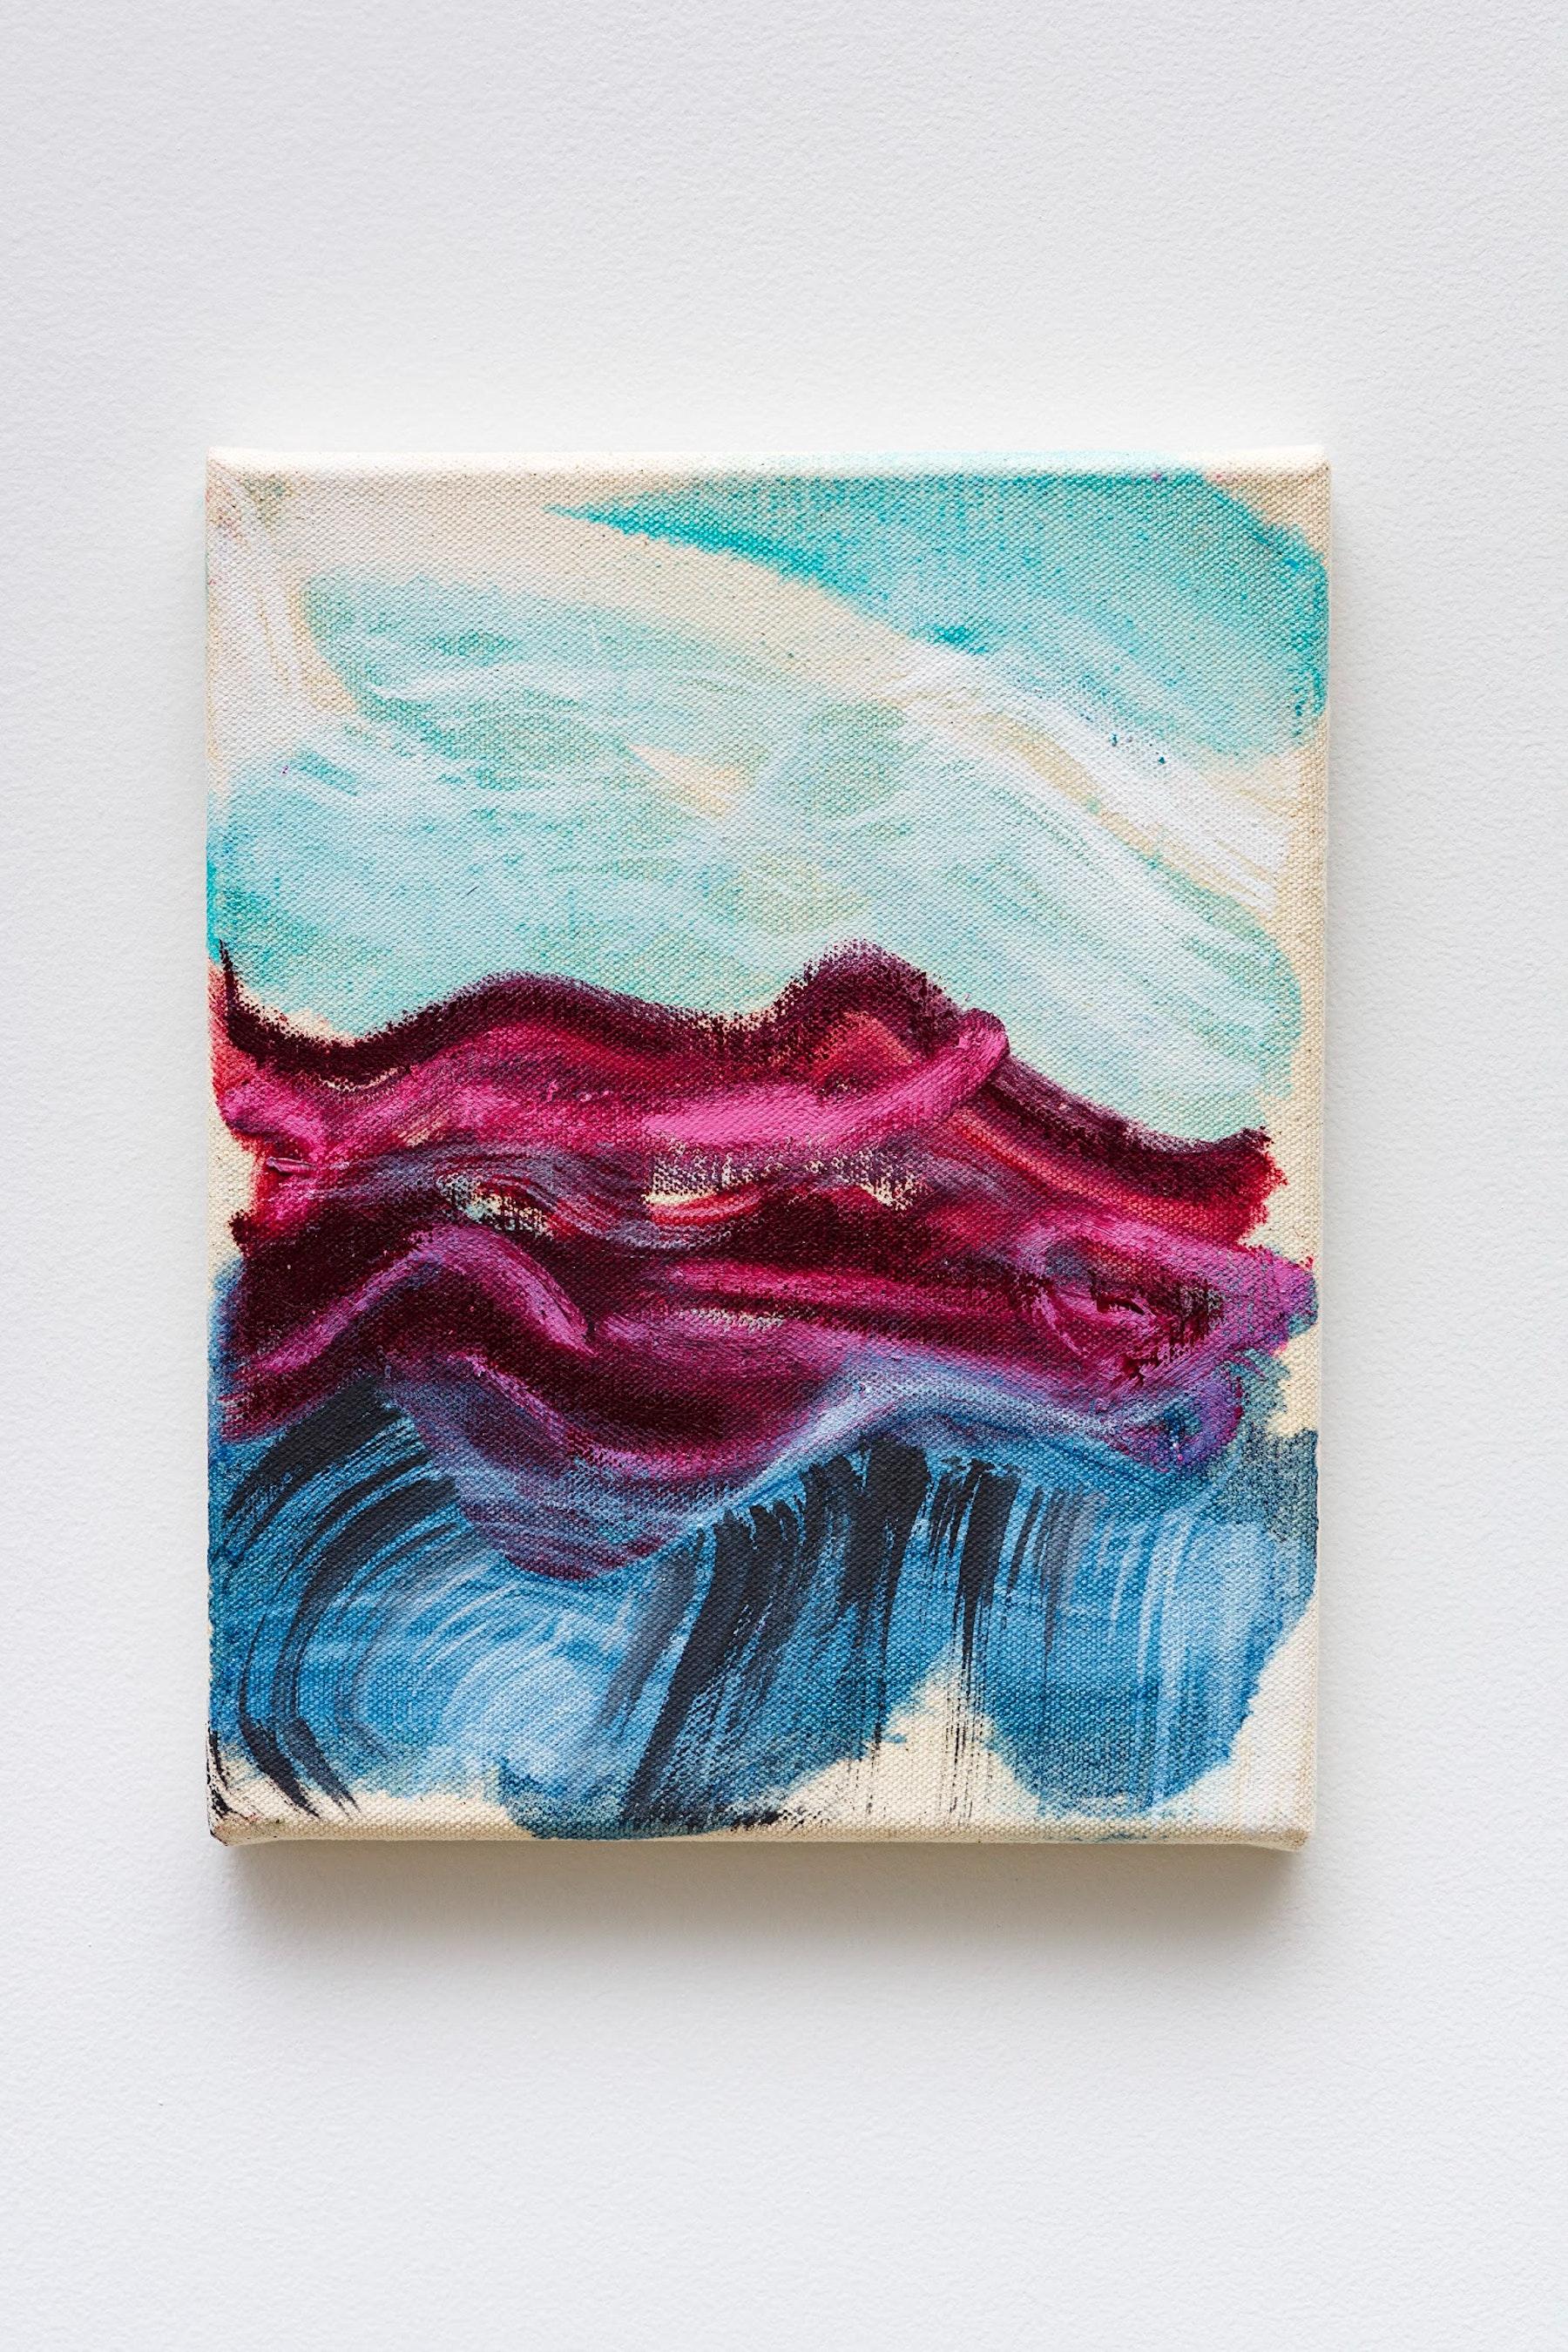 "Monique Van Genderen ""Untitled,"" 2020 Oil on canvas 10 x 8"" [HxW] (25.4 x 20.32 cm) Inventory #VGE402 Courtesy of the artist and Vielmetter Los Angeles Photo credit: Jeff Mclane"